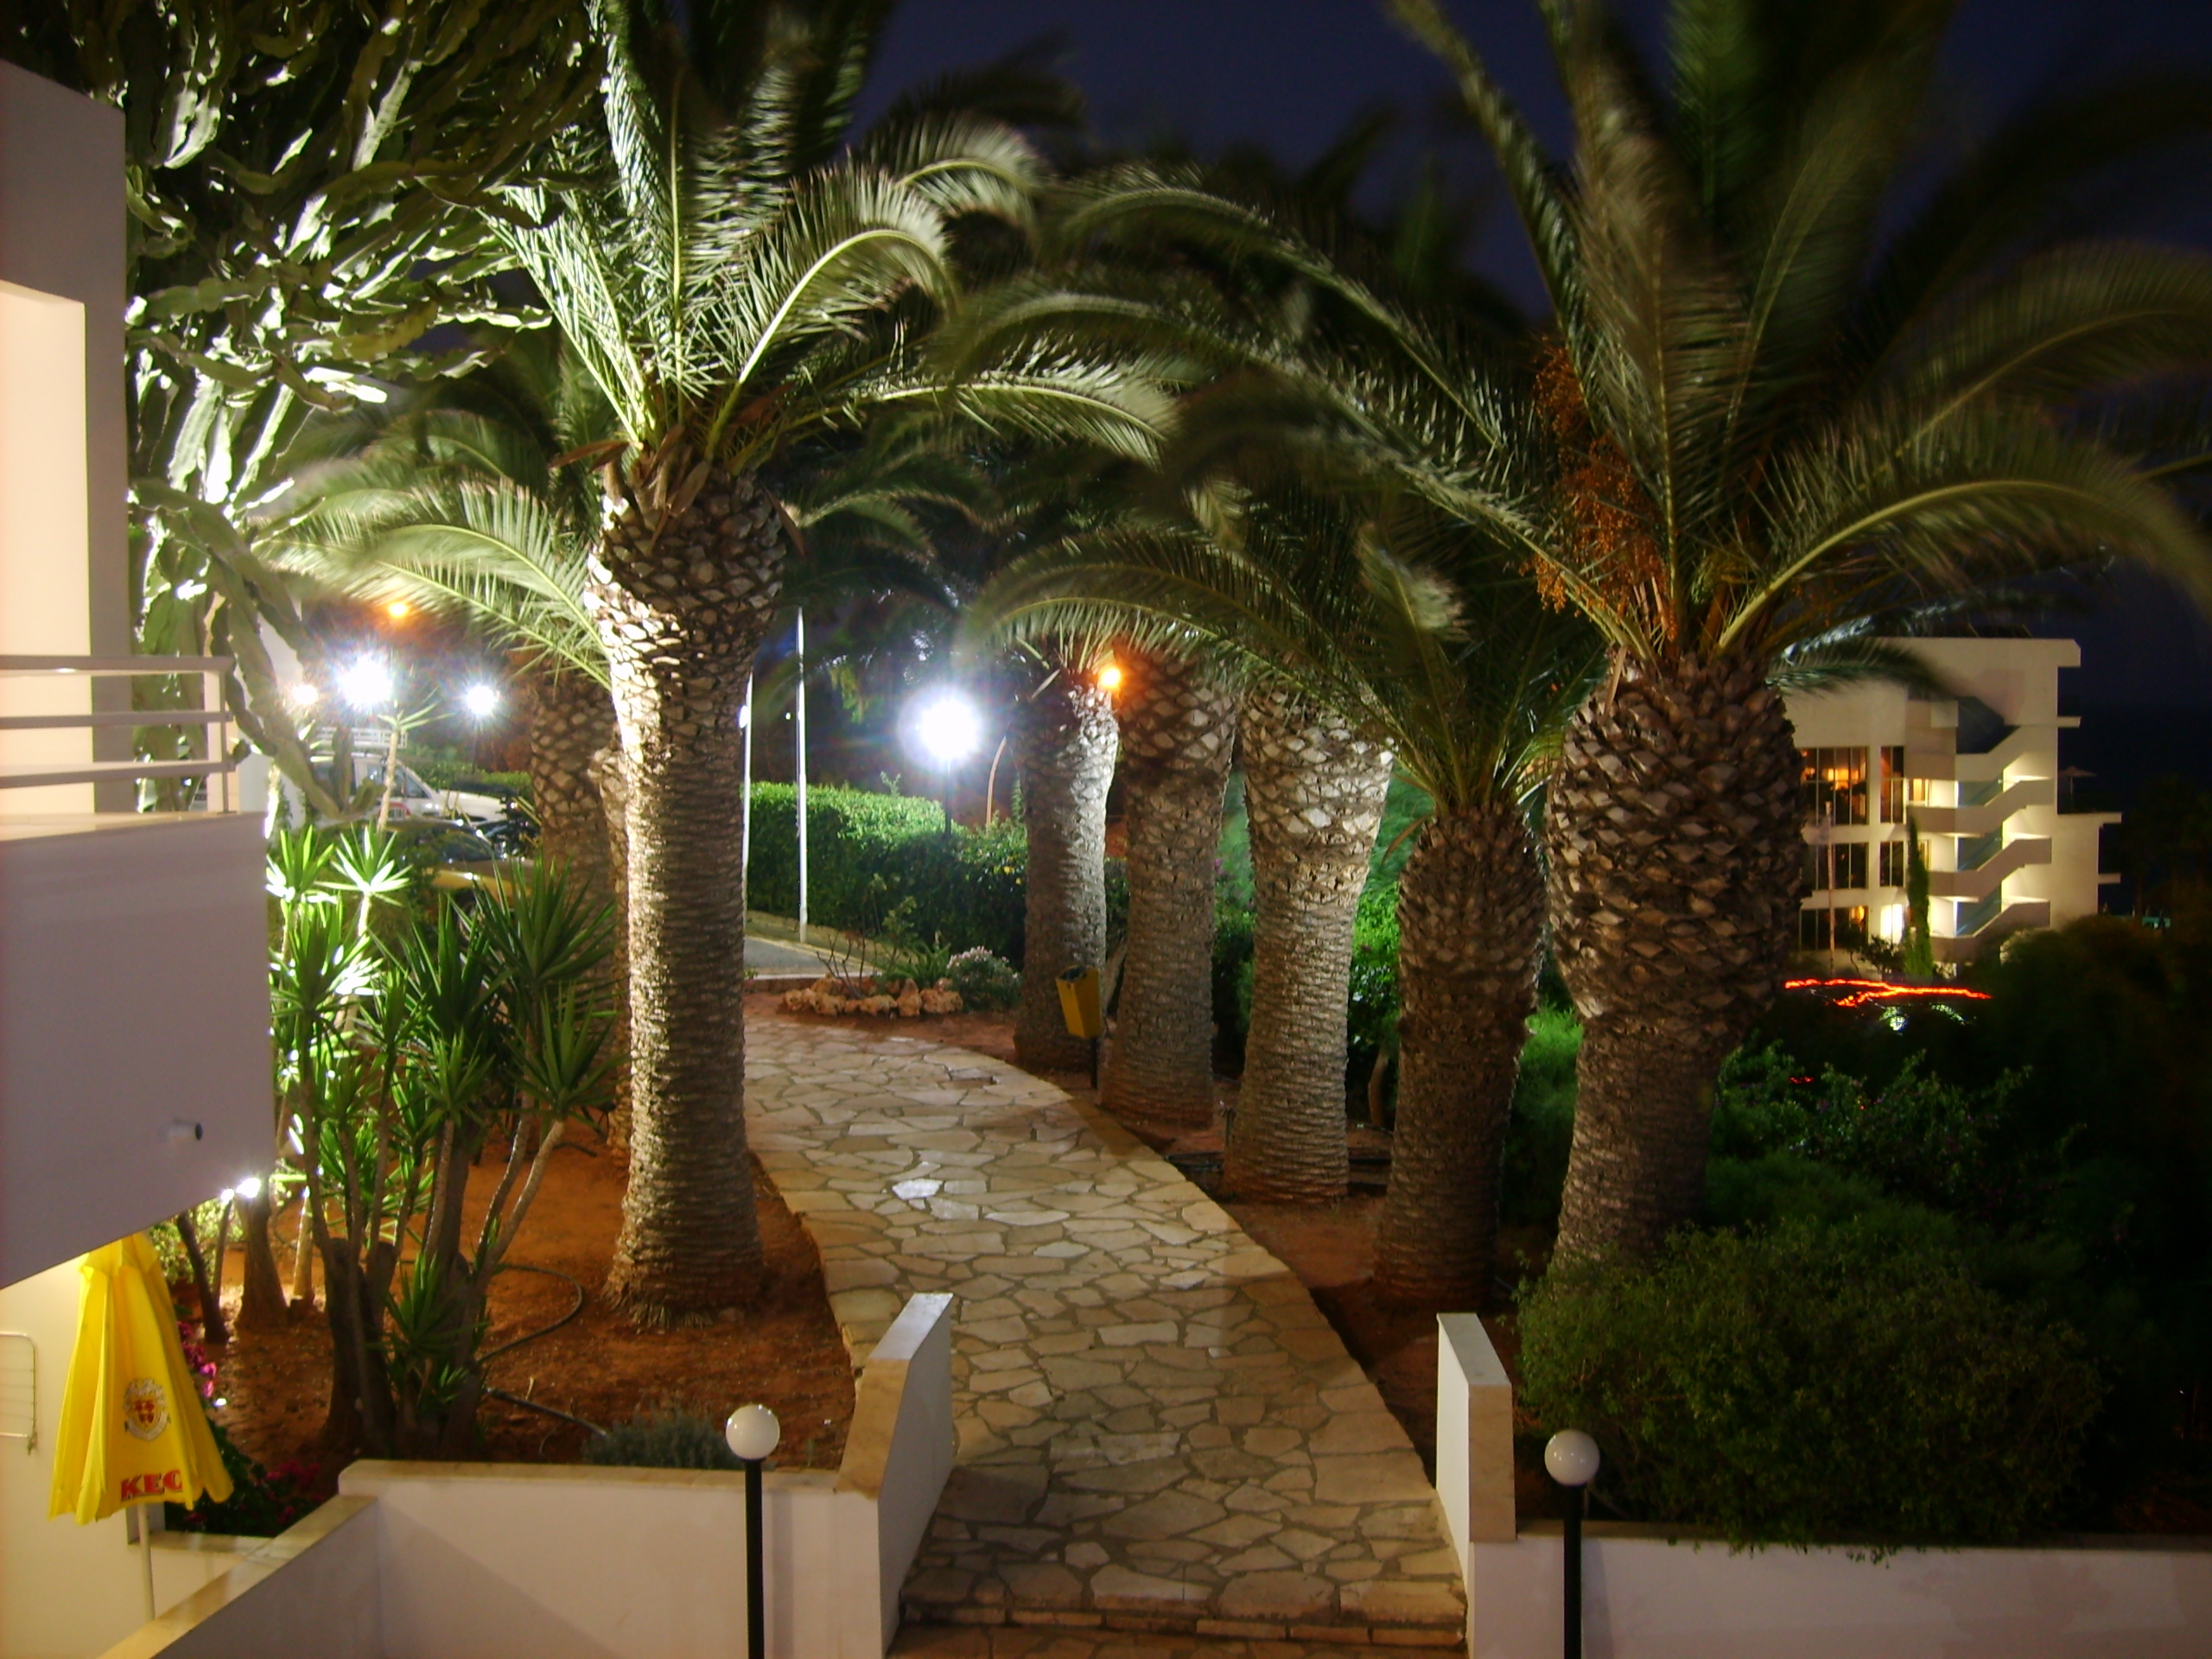 Территория отеля Bella Napa (Ceprus) - Кипр